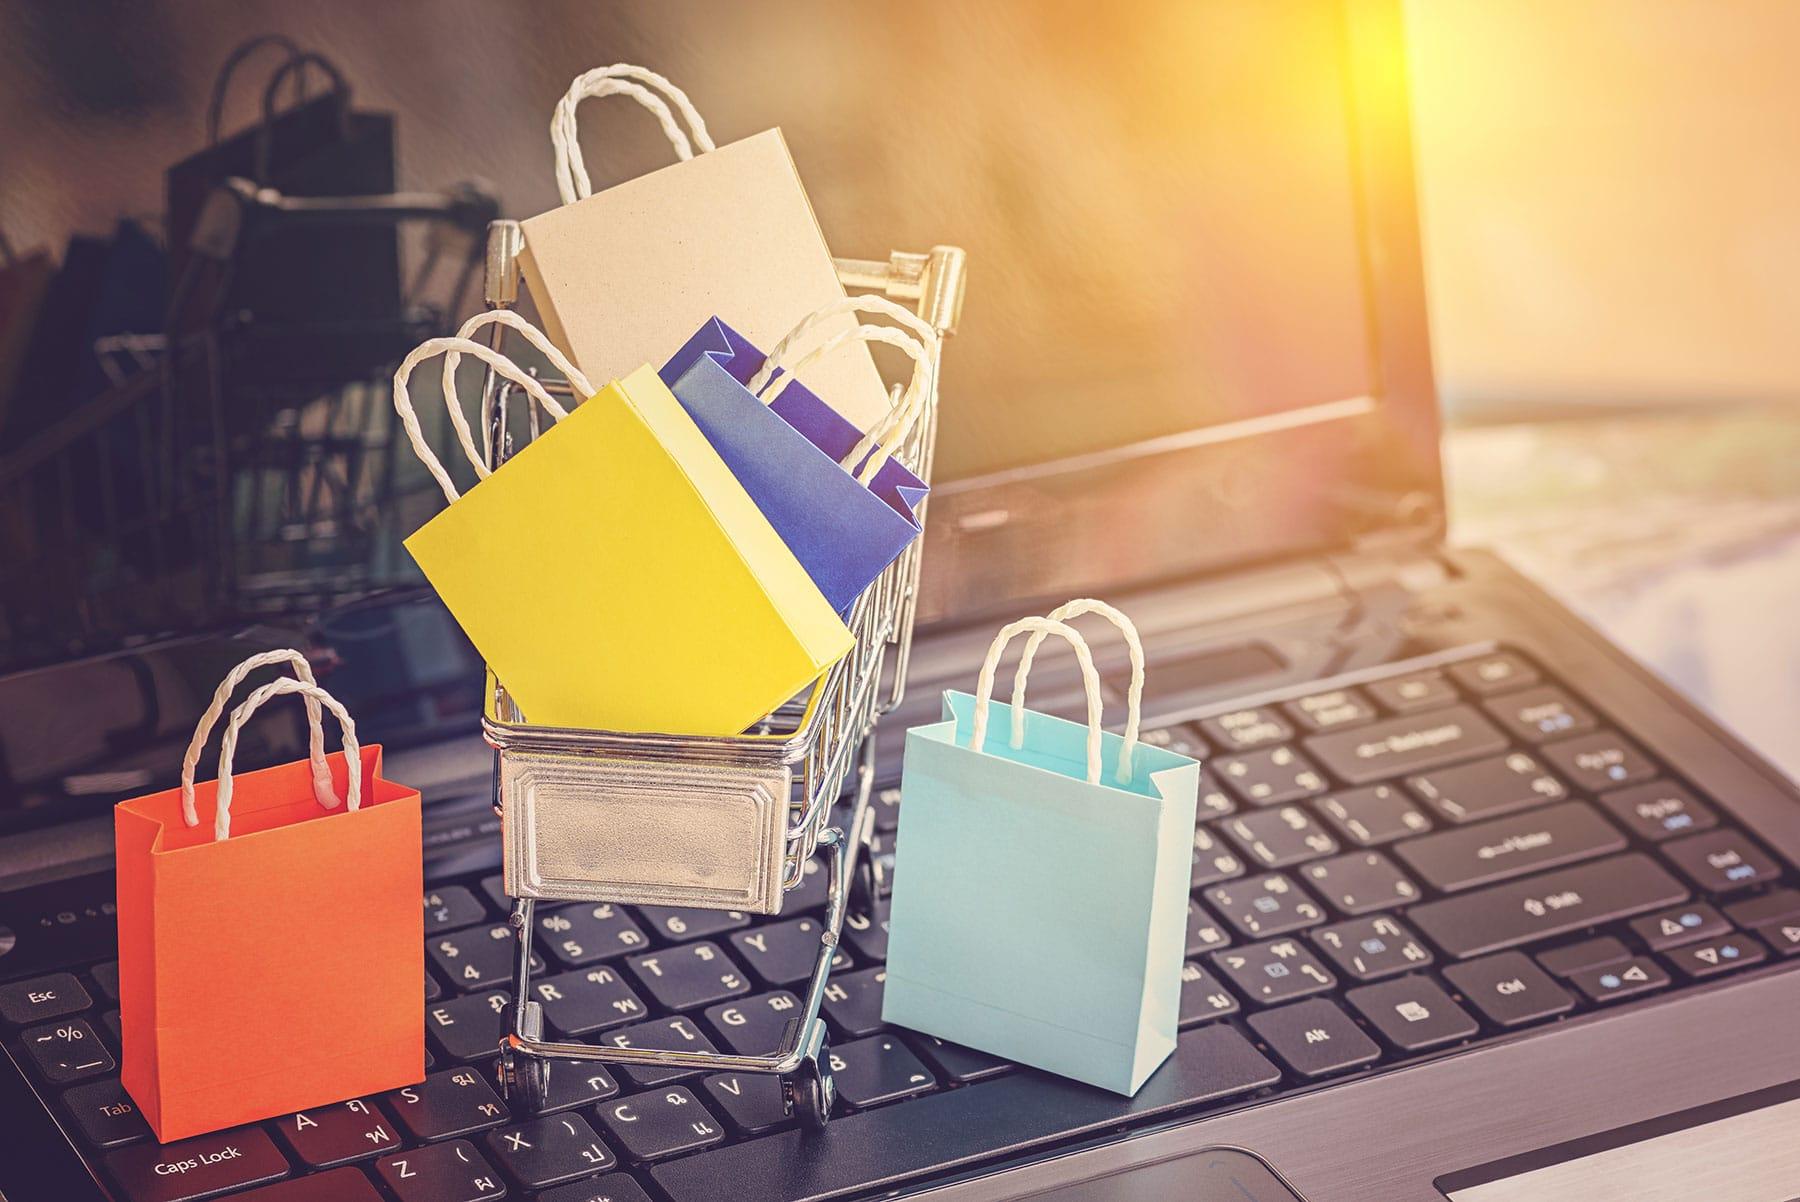 Woocommerce verkkokauppa – blogi